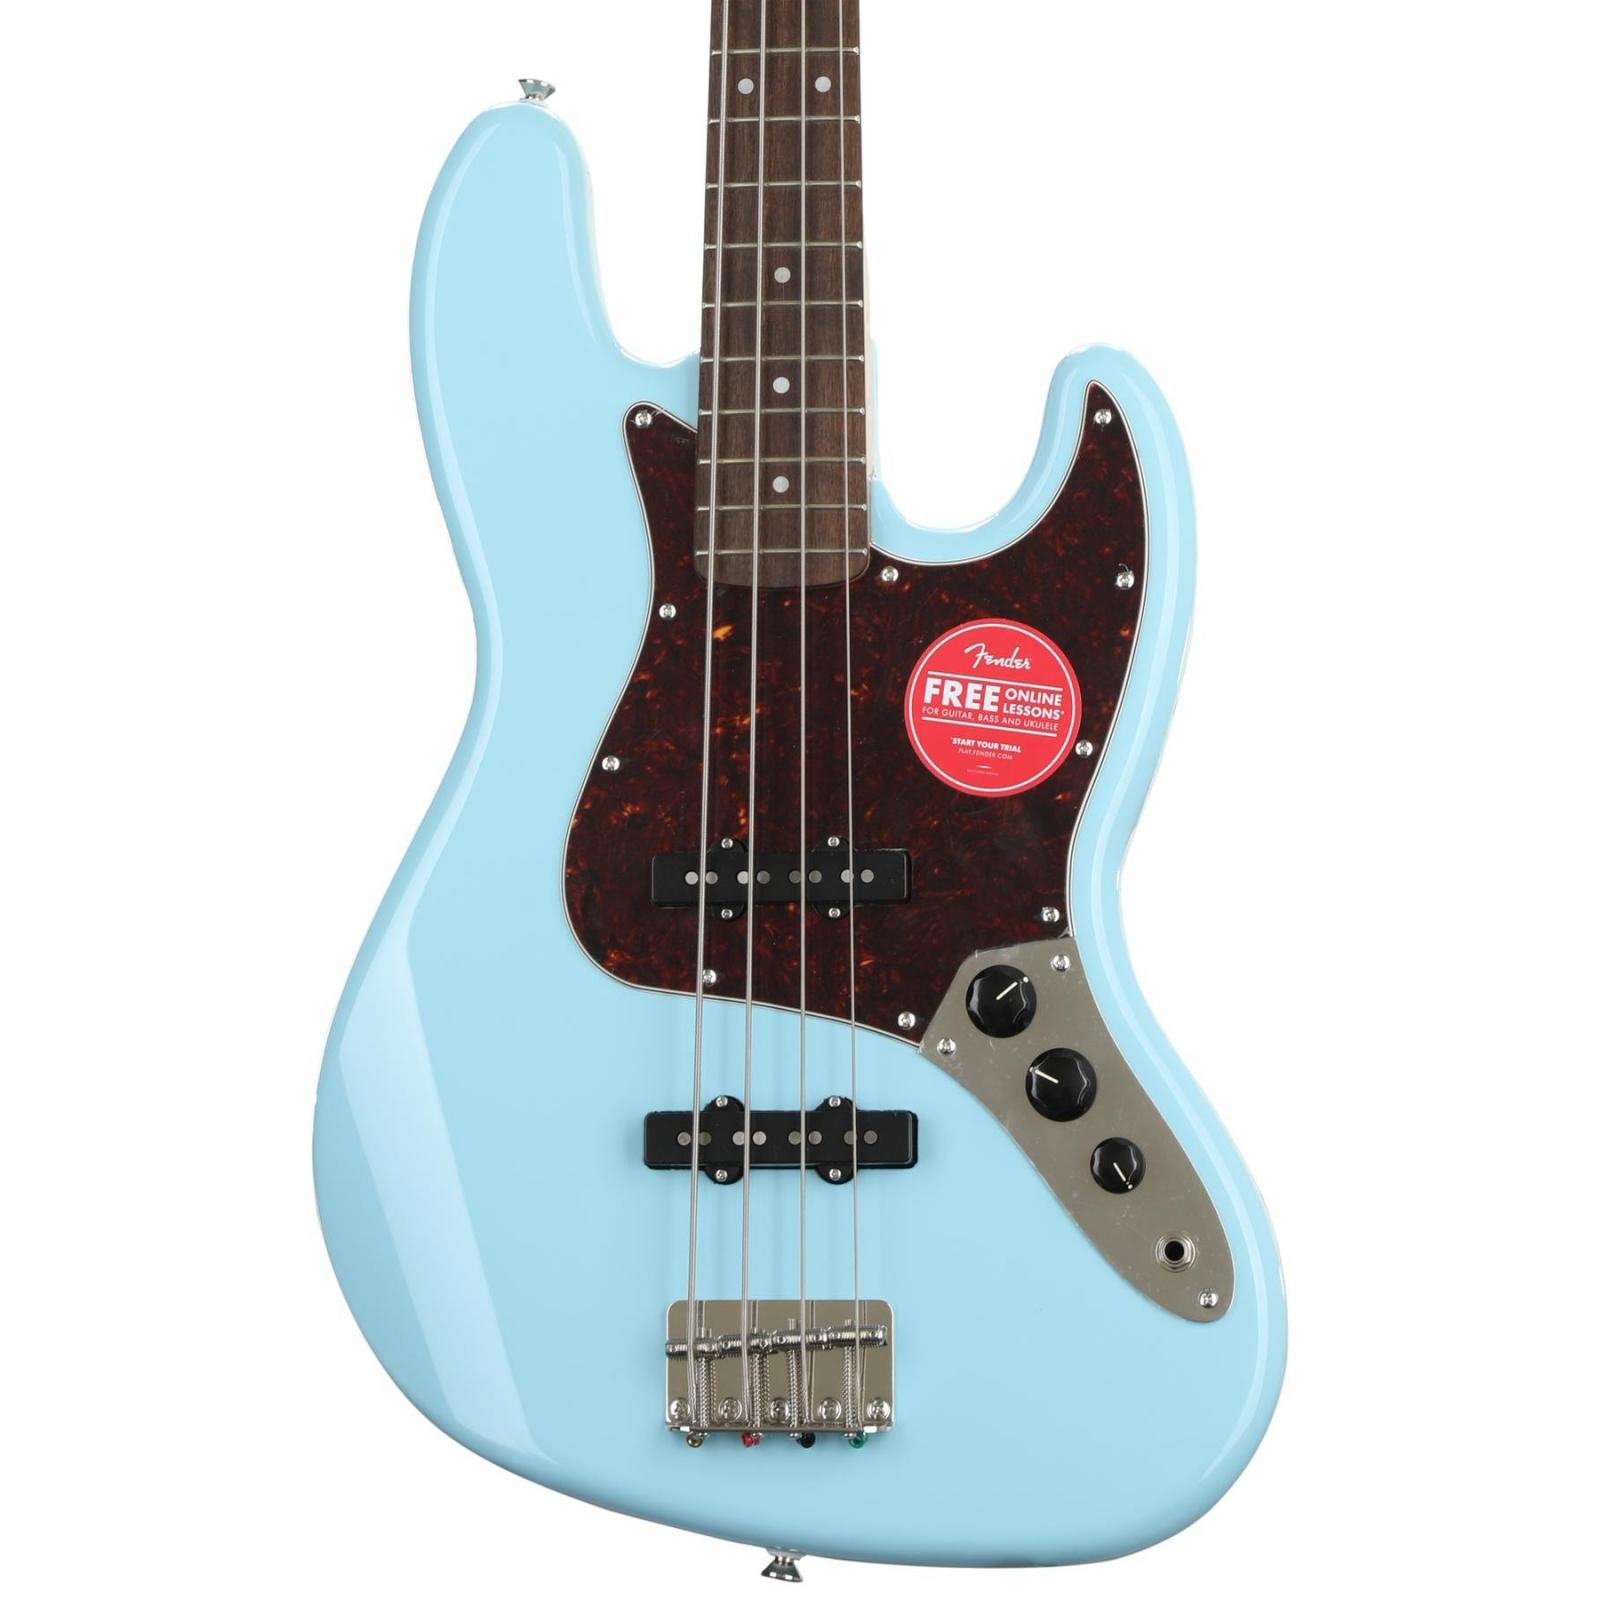 Fender Squier Classic Vibe 60s Jazz Bass Guitar